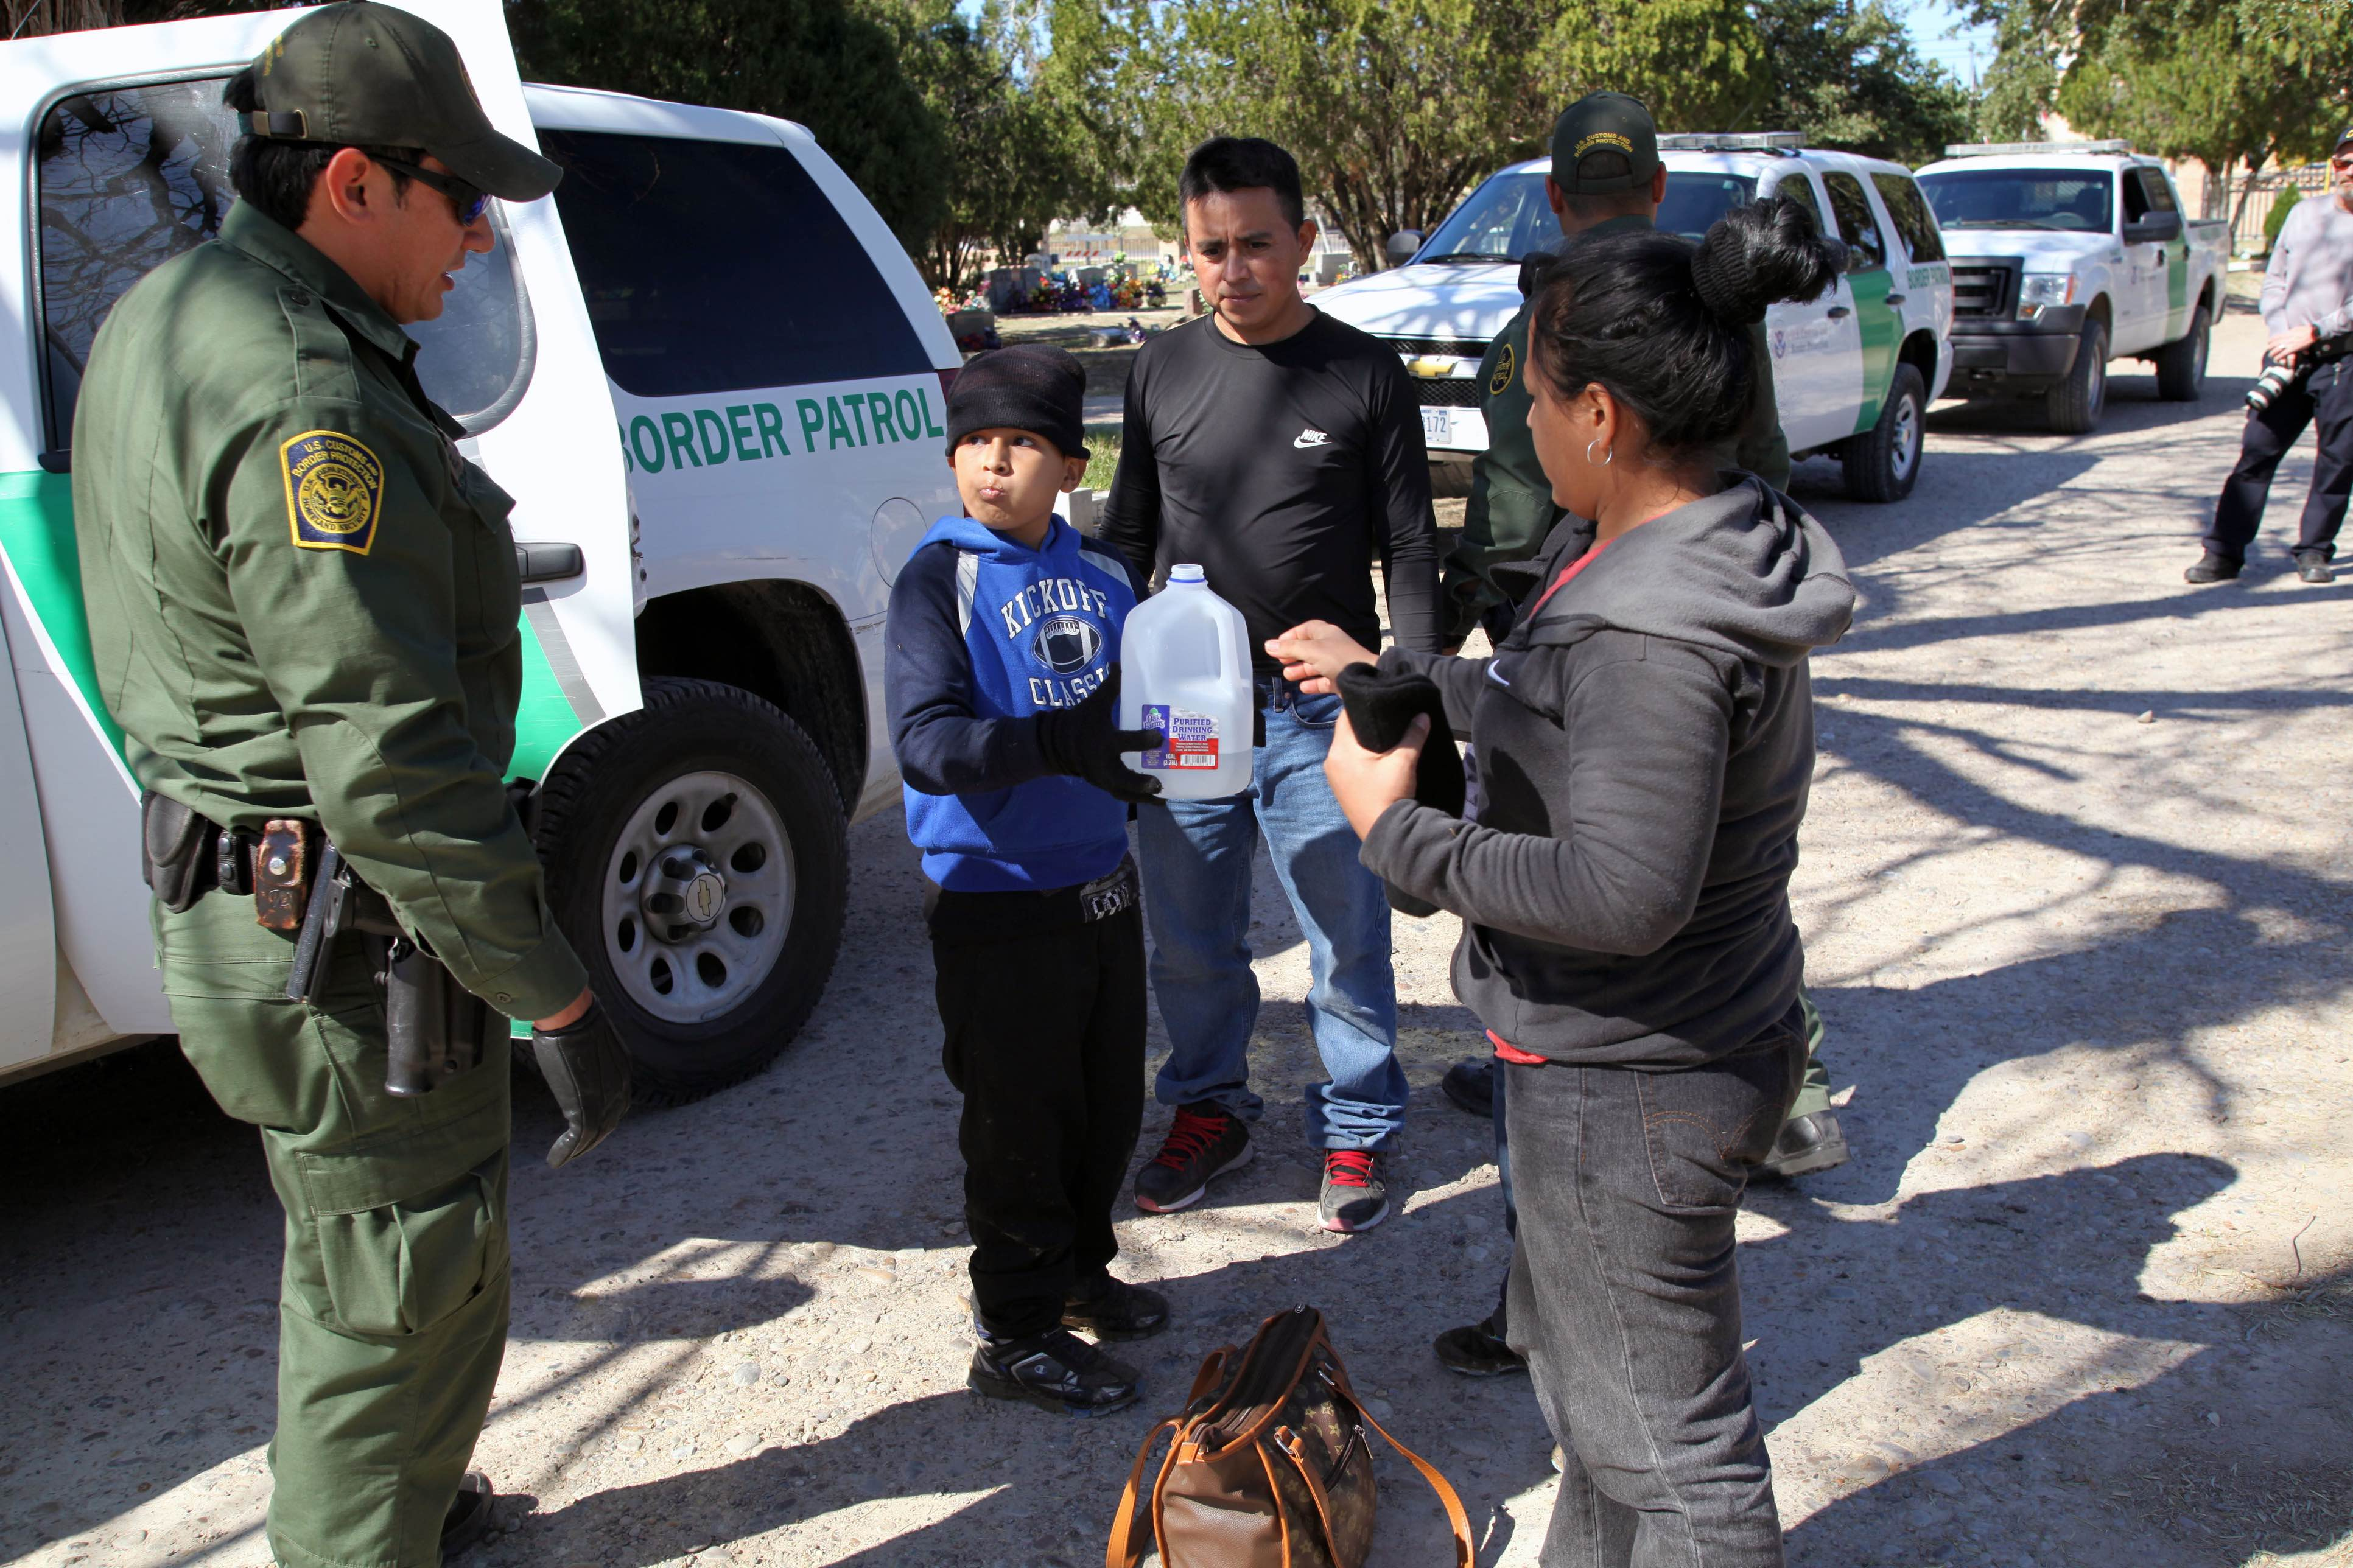 Alejandro G. Iñárritu's Virtual Reality Installation on Undocumented Immigrants Is Opening in LA